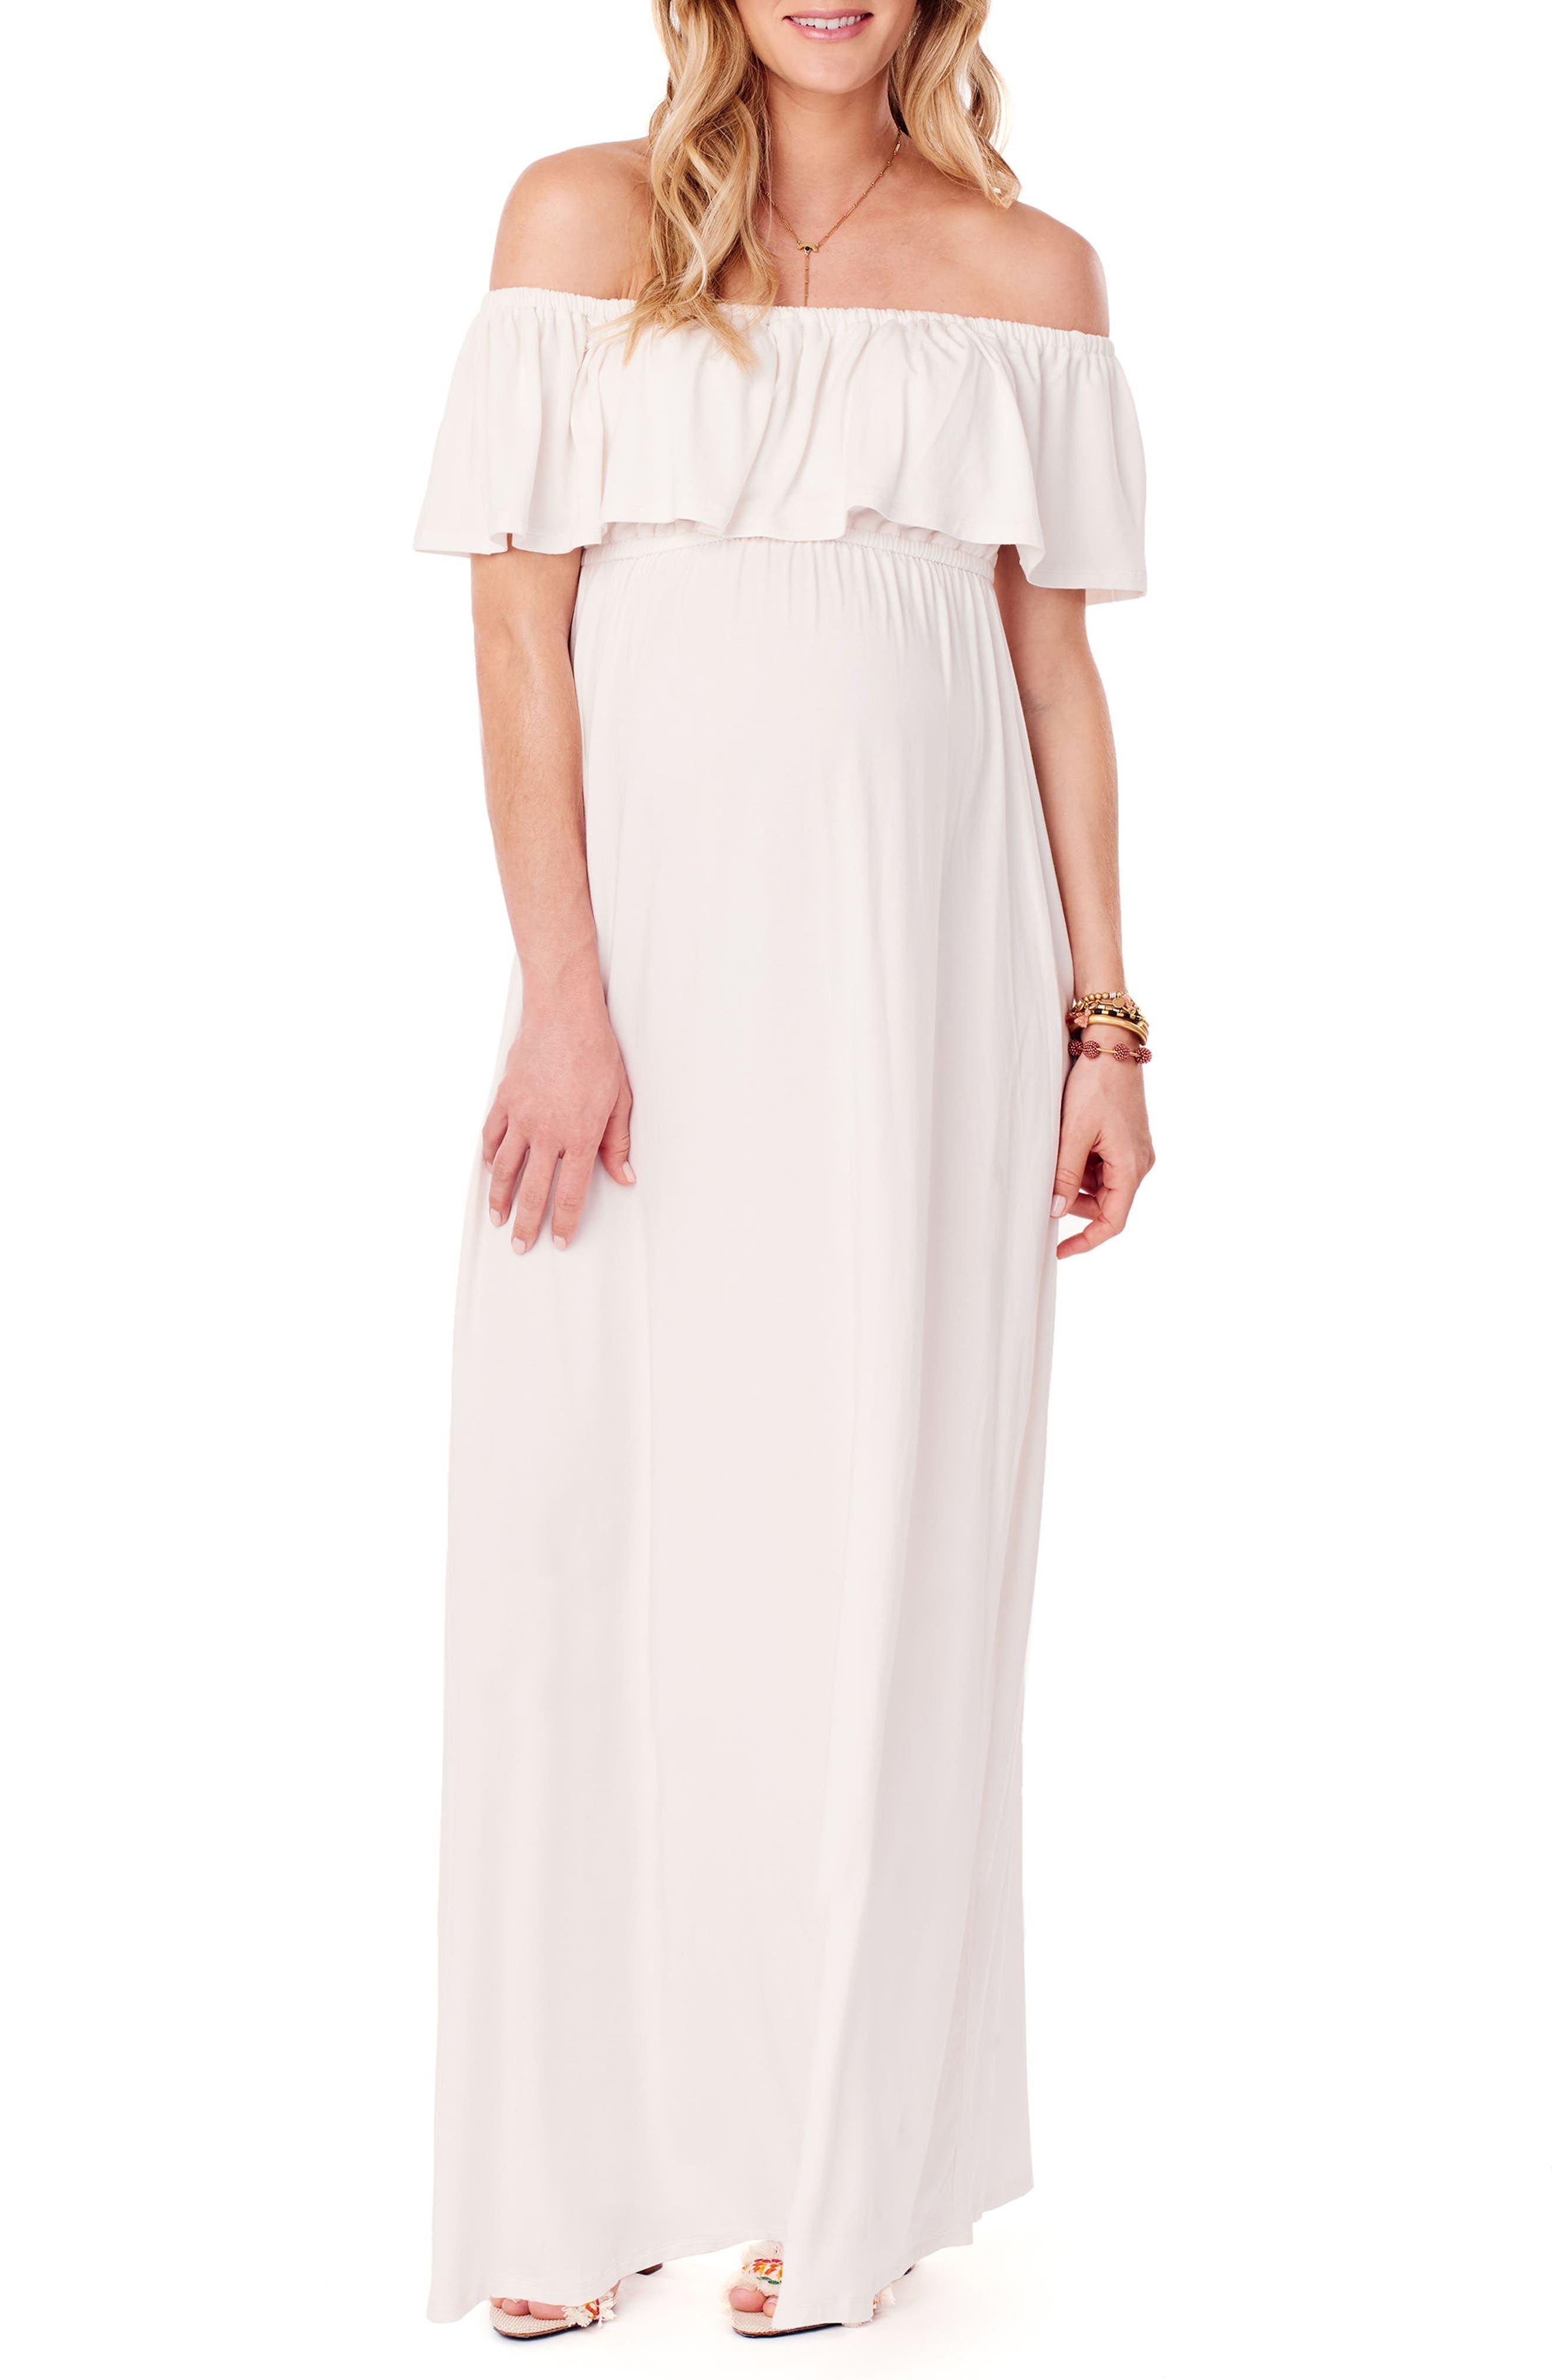 Main Image - Ingrid & Isabel® Off the Shoulder Maternity Maxi Dress